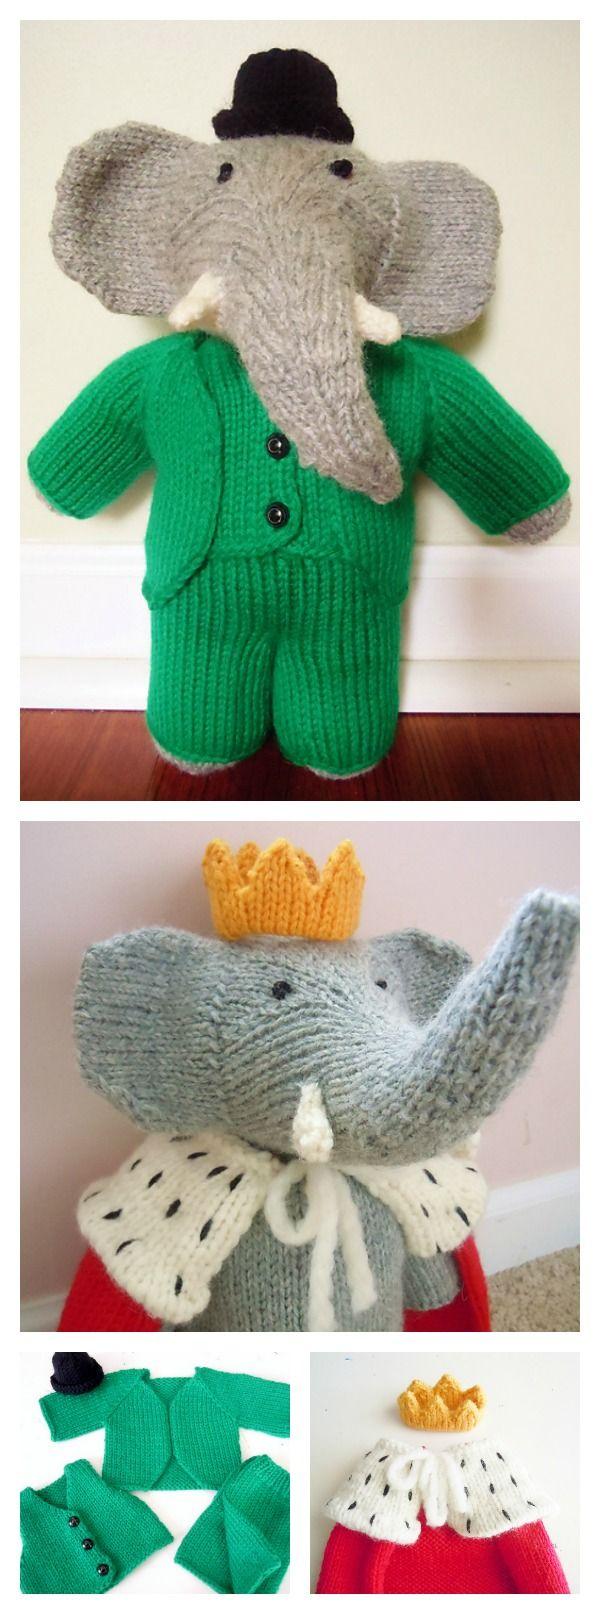 Knitting elephant toy free patterns free pattern toy and patterns free babar elephant toy knitting pattern bankloansurffo Choice Image